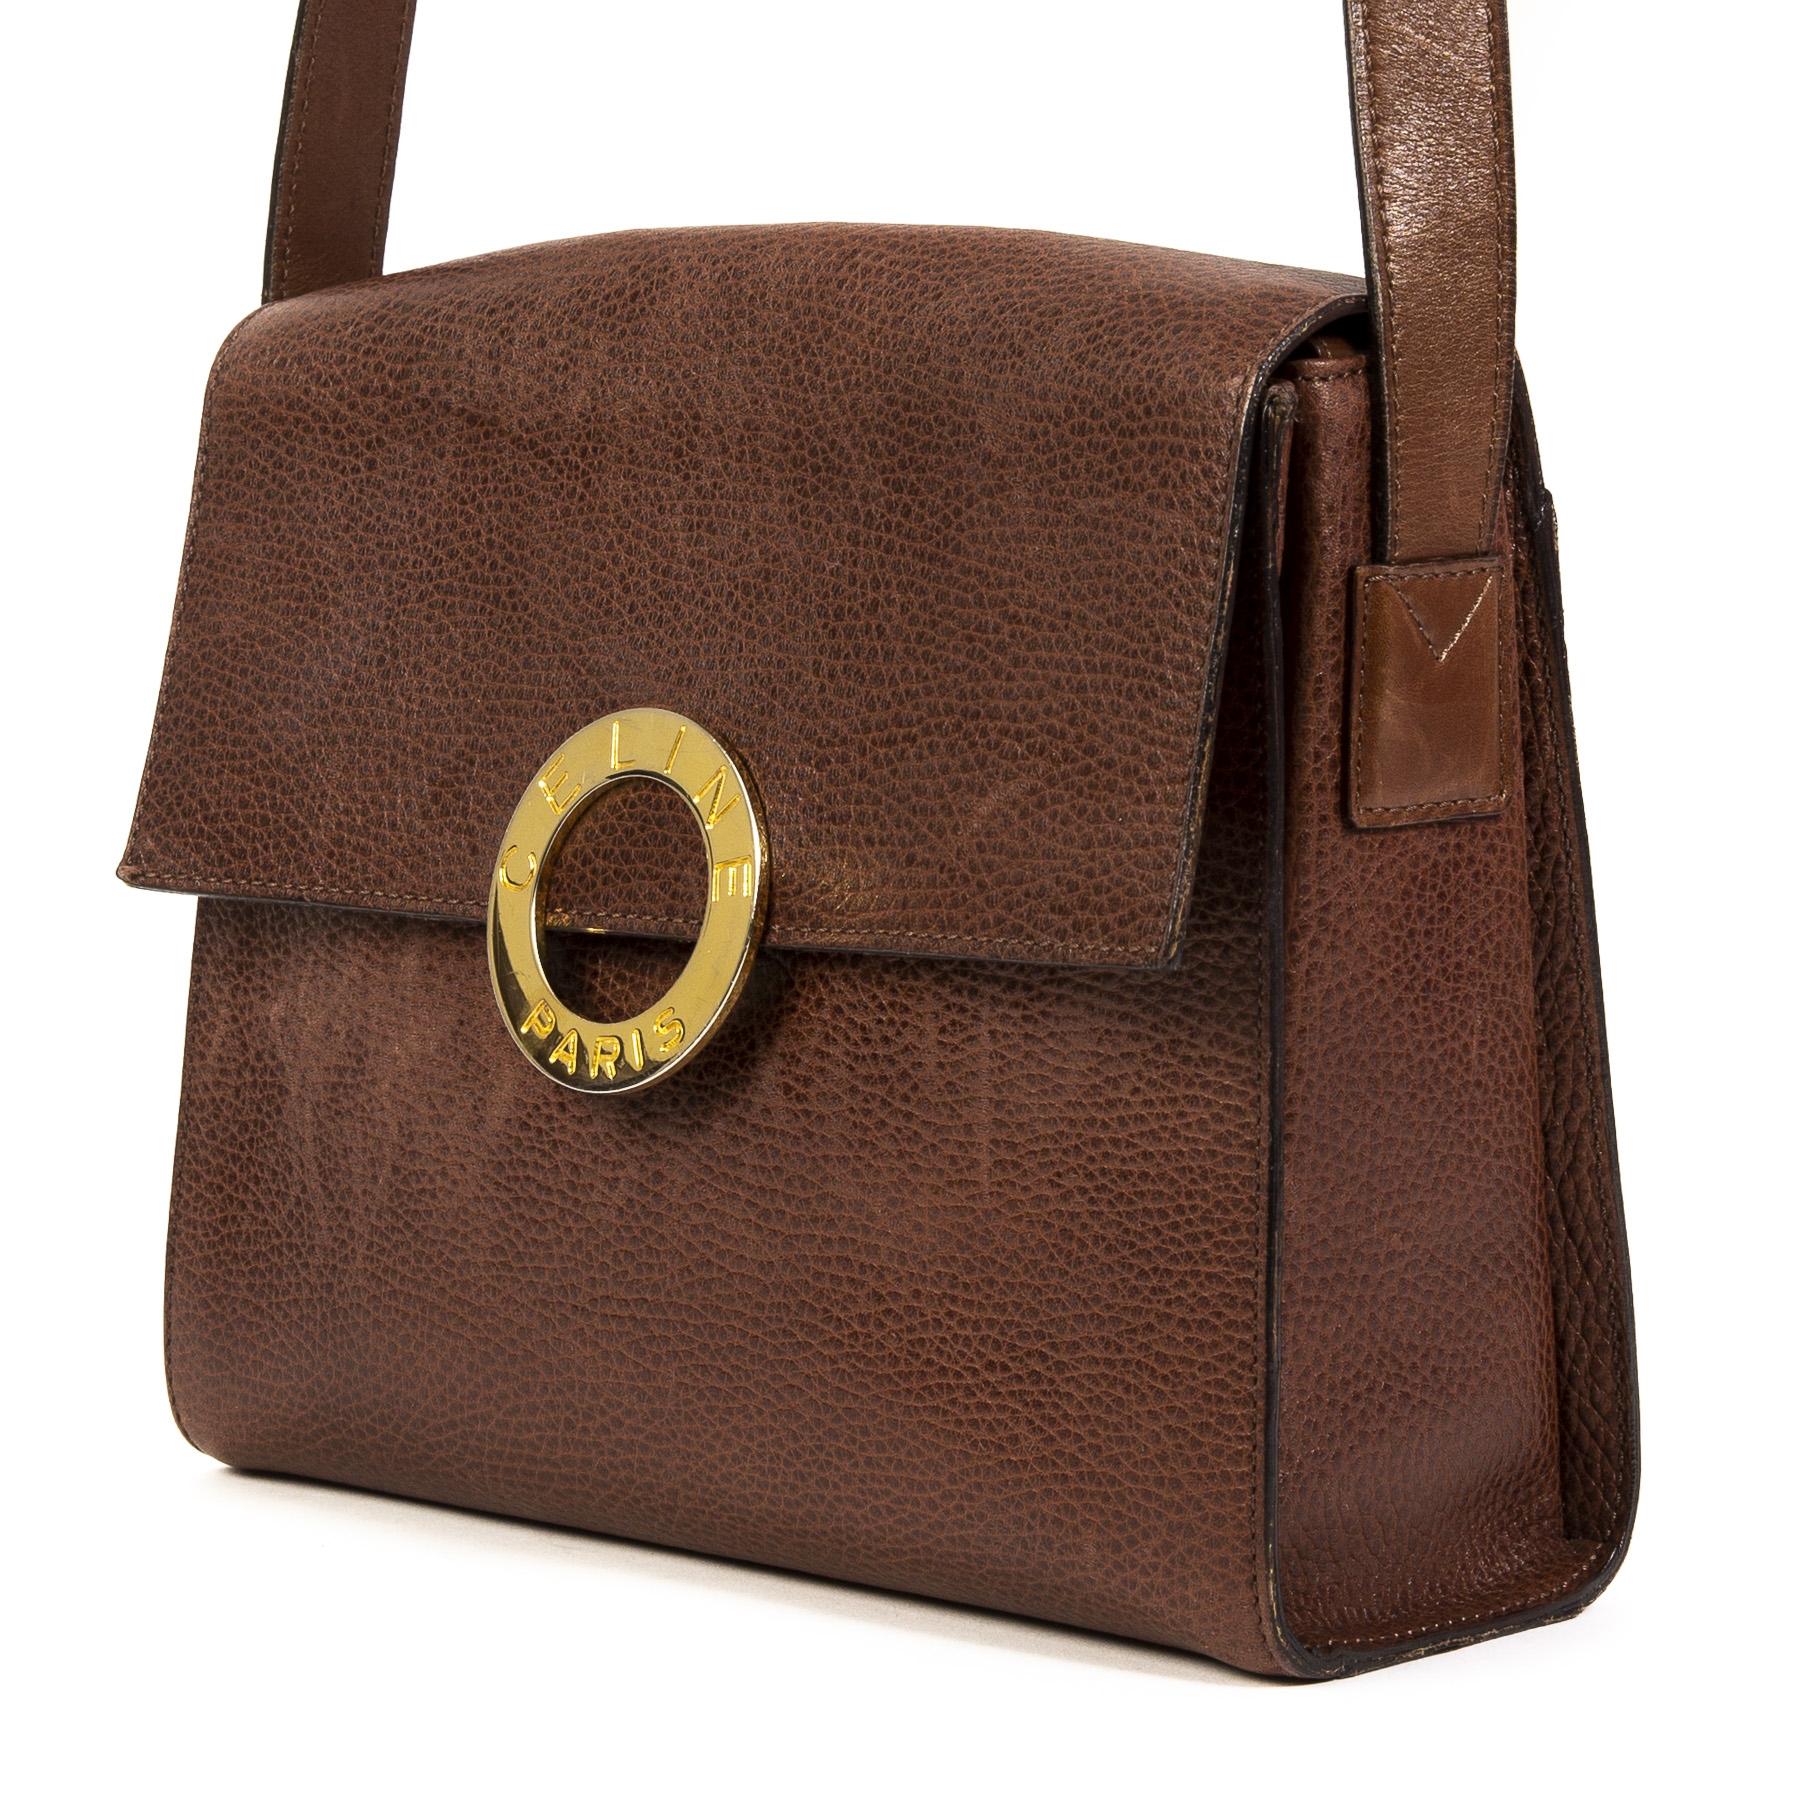 5ac8dc553cda Céline Vintage Golden Circle Crossbody Bag Buy this authentic second-hand  vintage Céline Vintage Golden Circle Crossbody Bag at online webshop